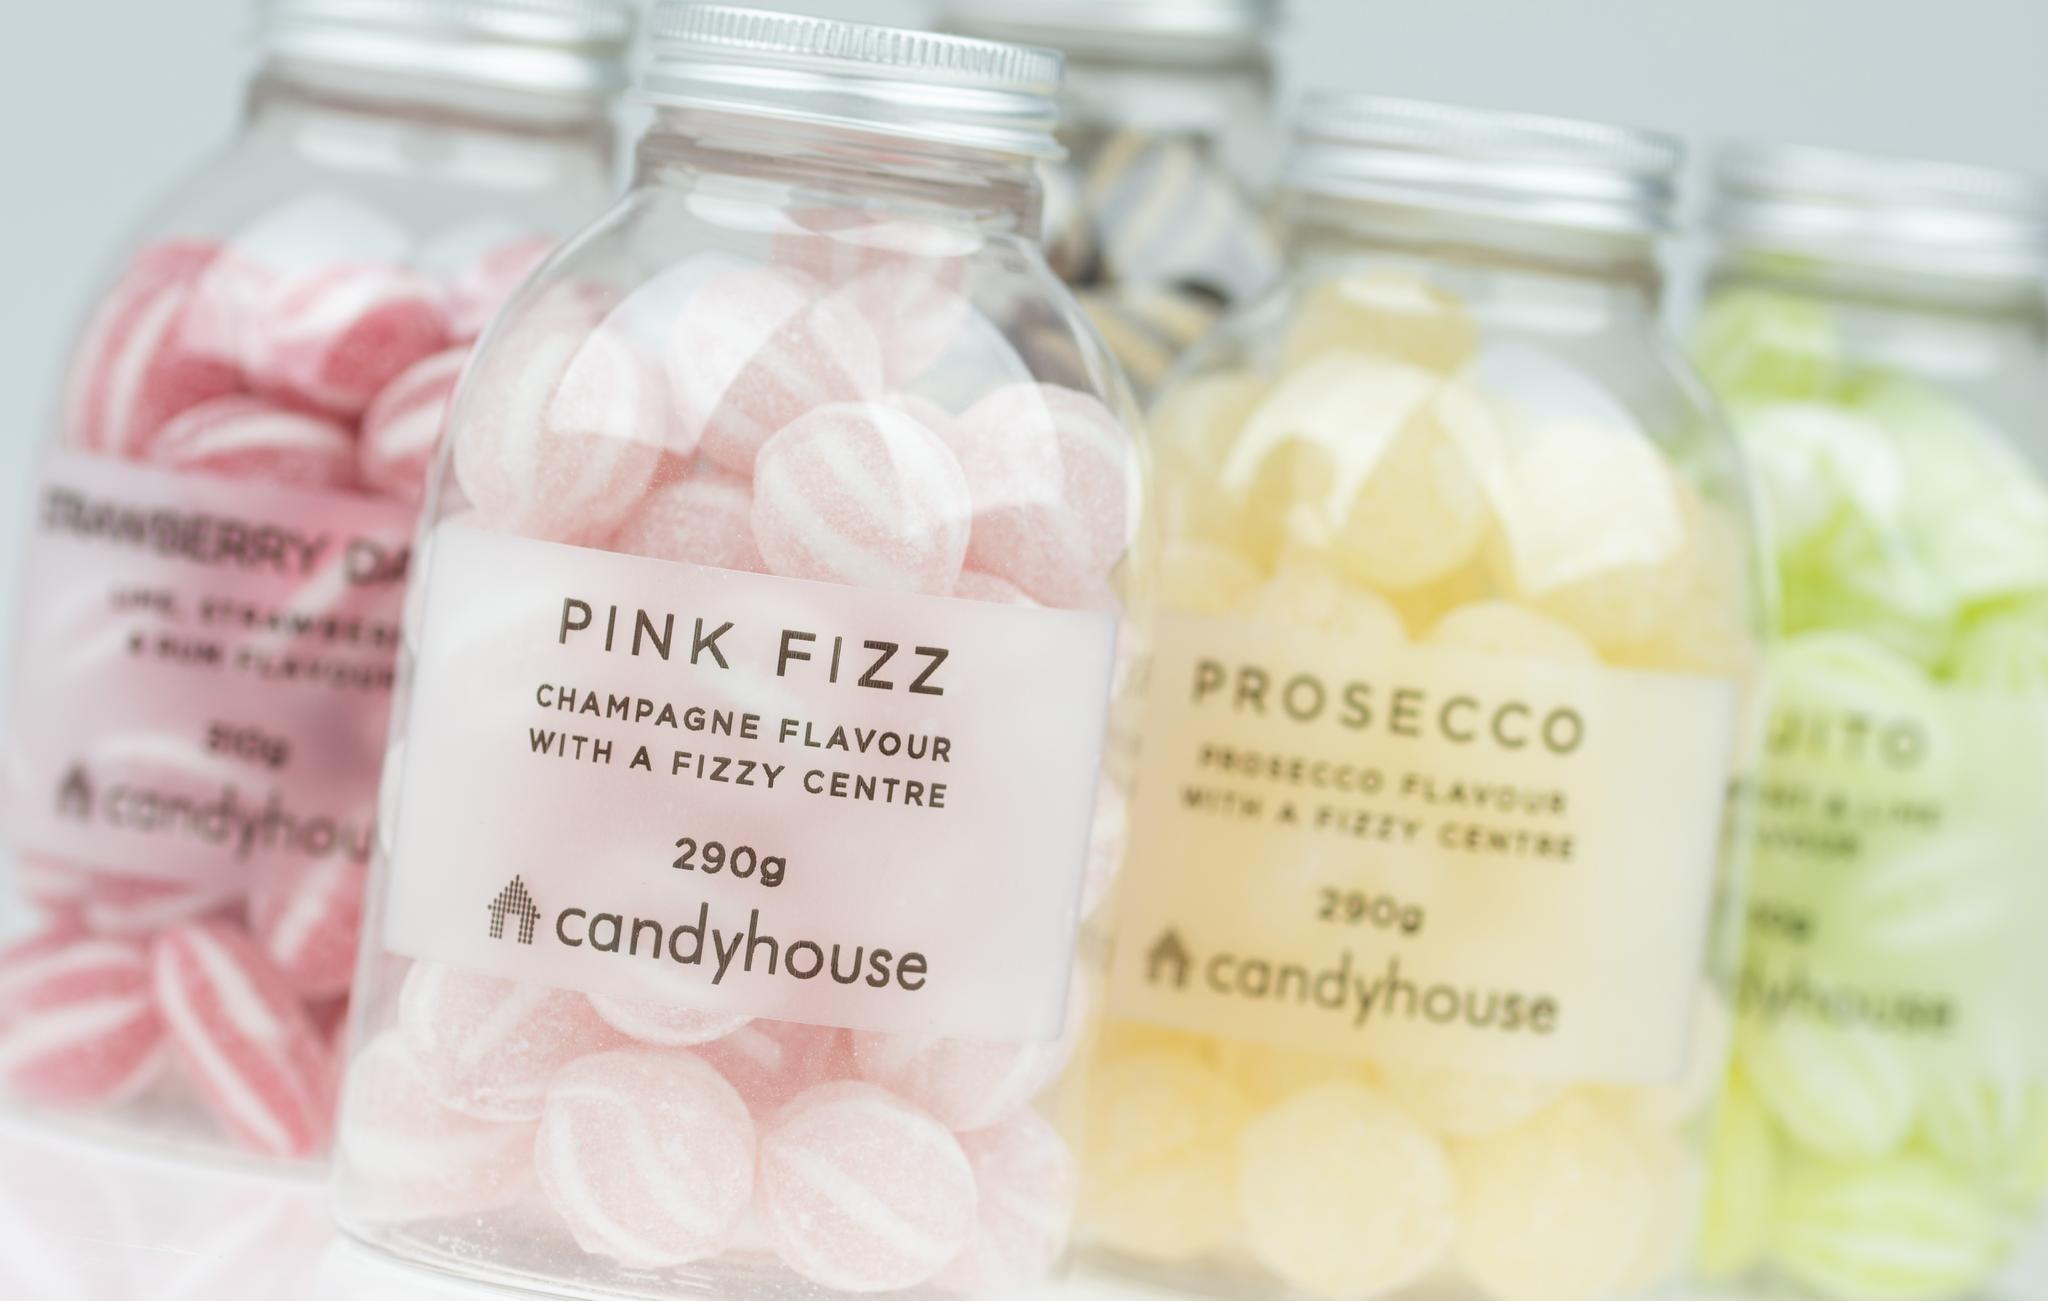 Candyhouse Ltd